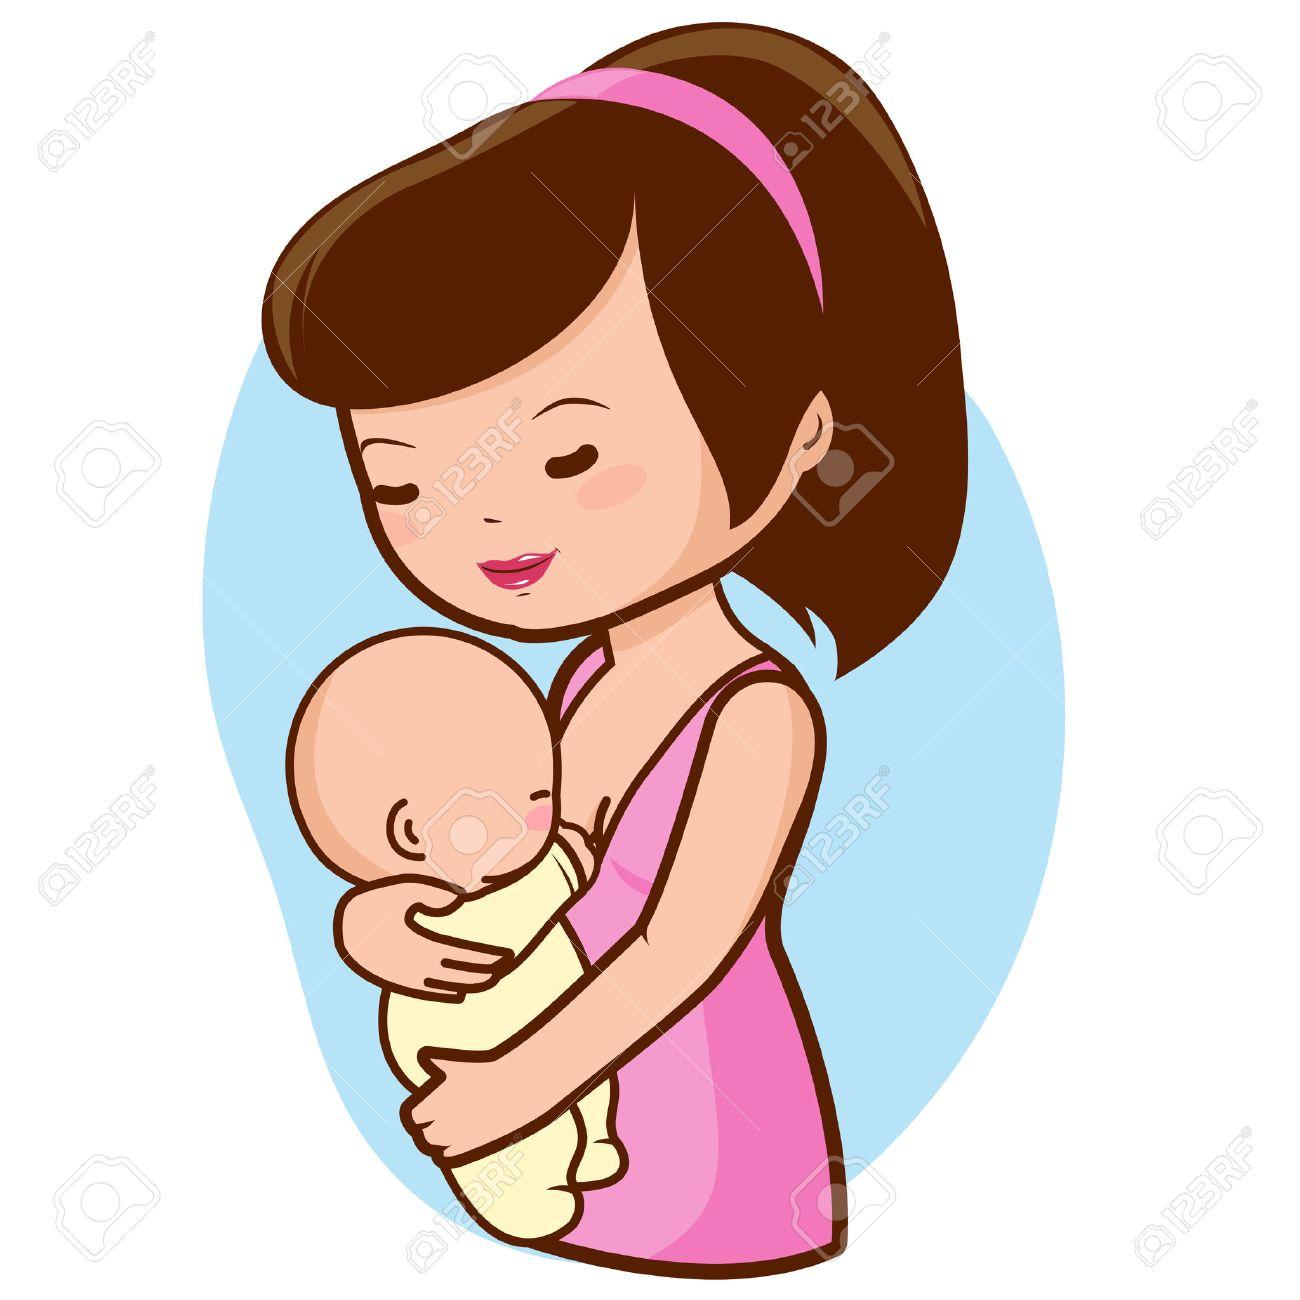 Mother breastfeeding baby.